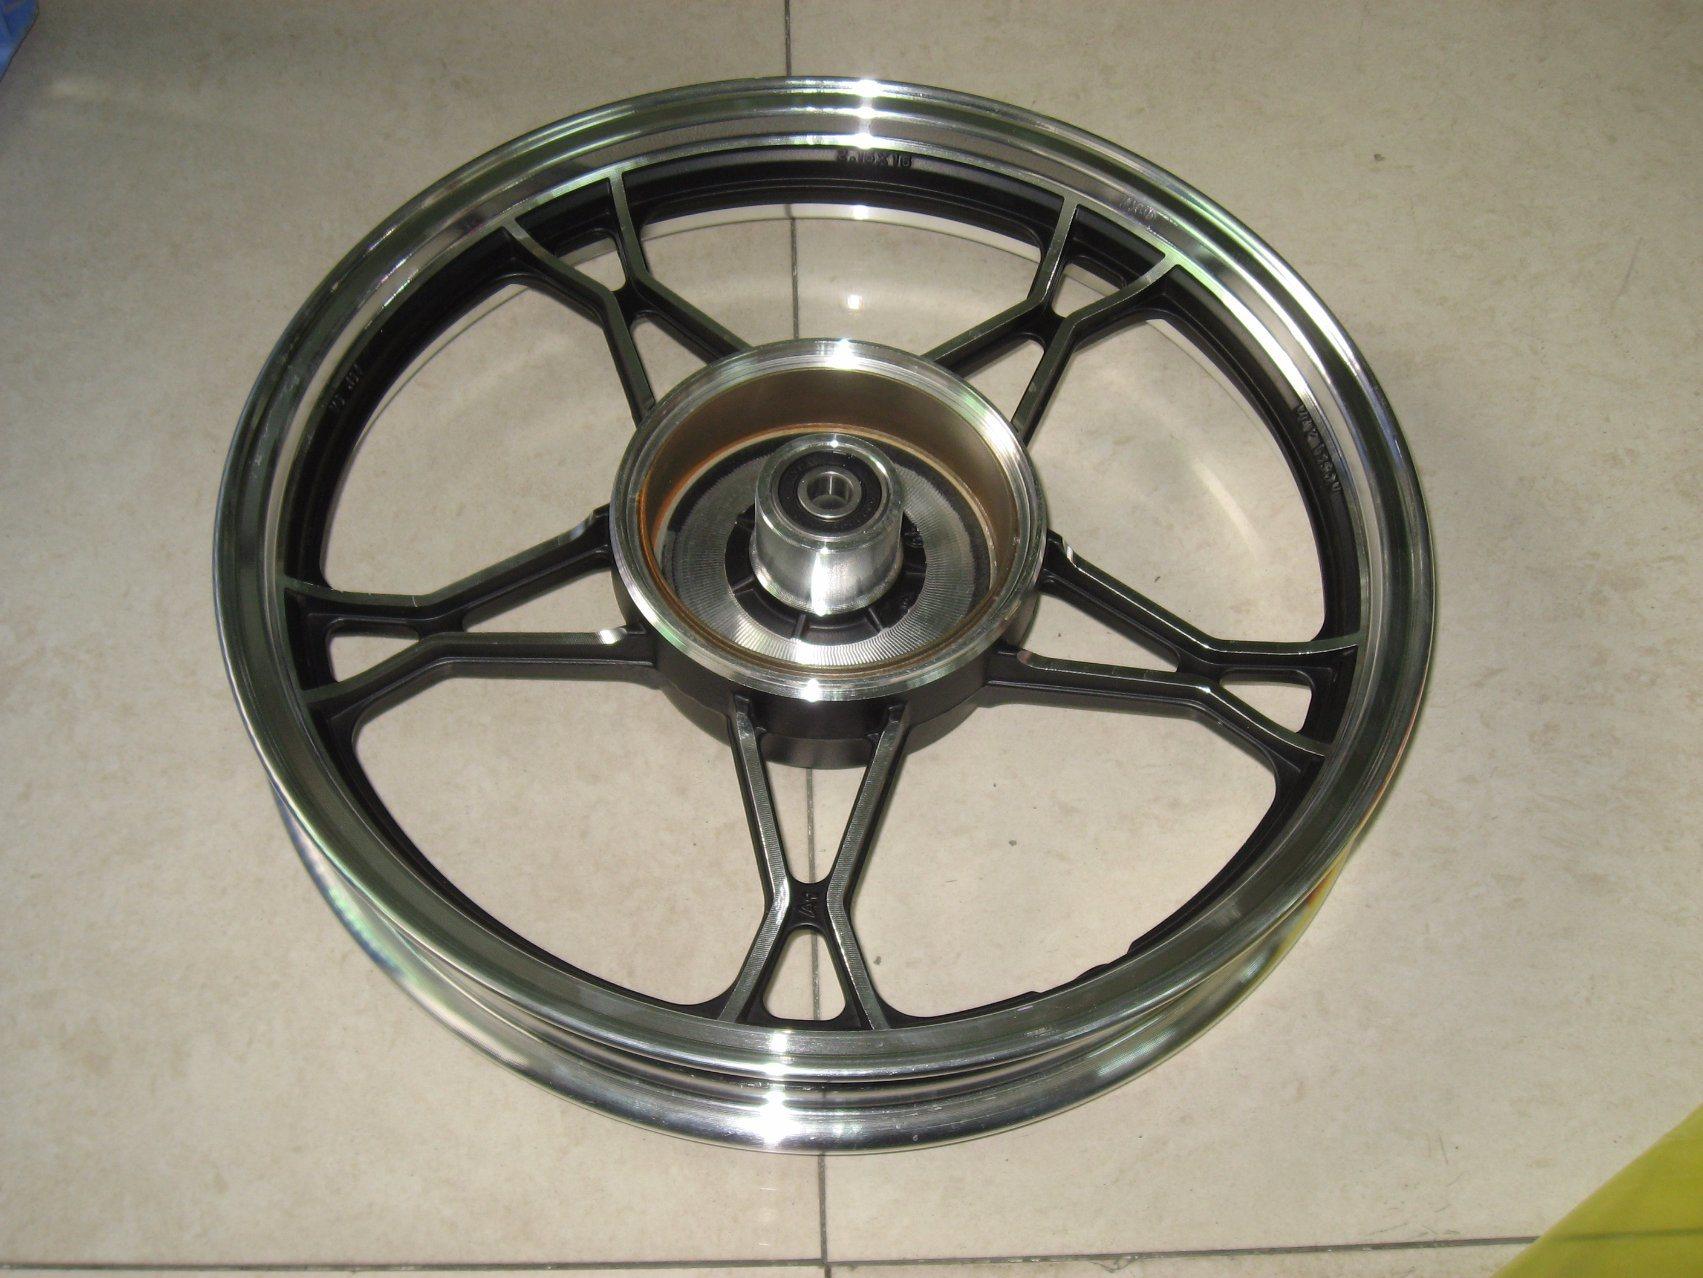 Yog Motorcycle Parts Motorcycle Rear Alloy Wheel Rim Gn125h/2.15-16